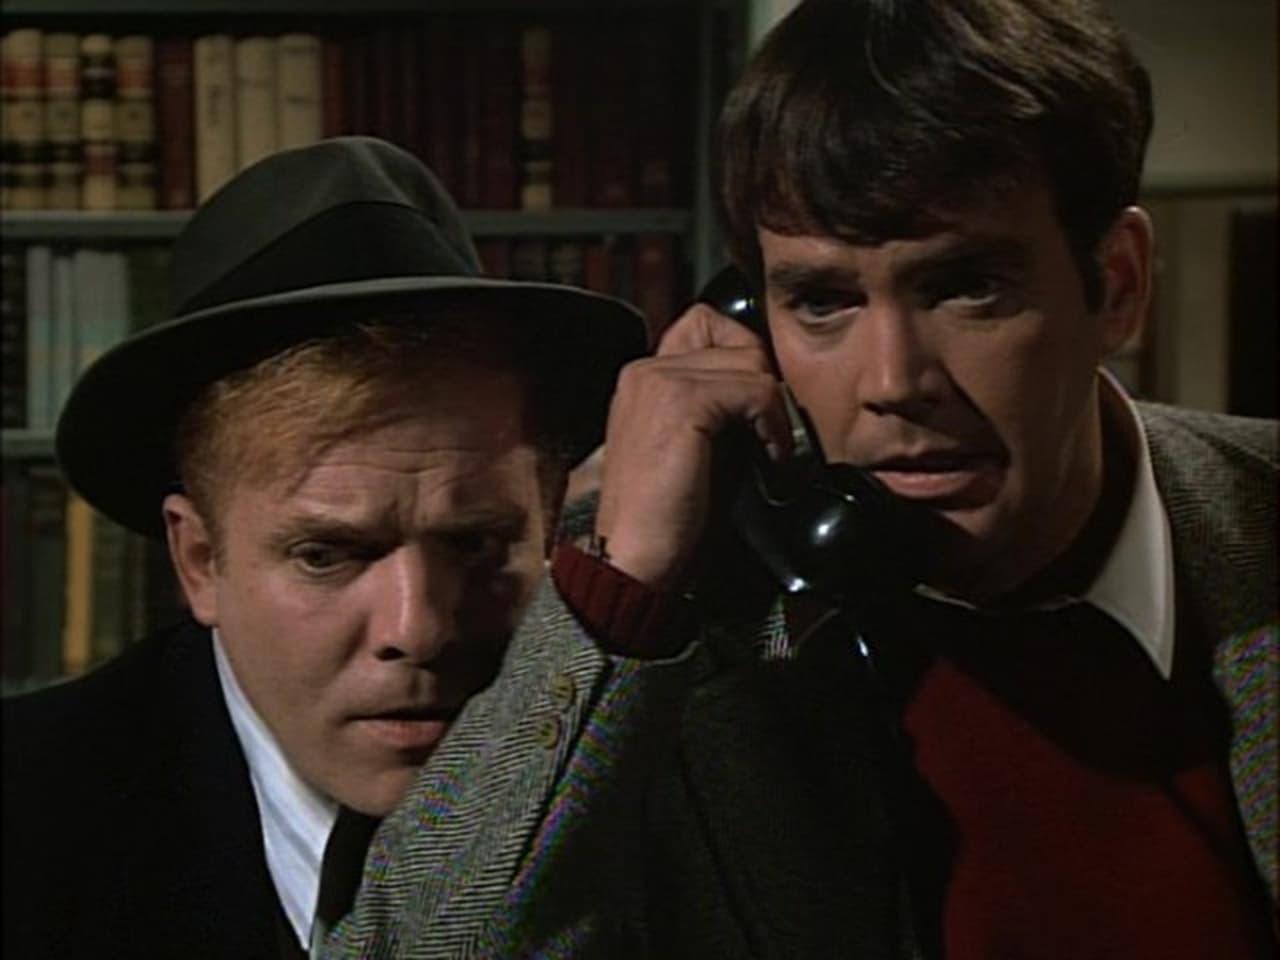 Ellery Queen Episode: The Adventure of the Wary Witness